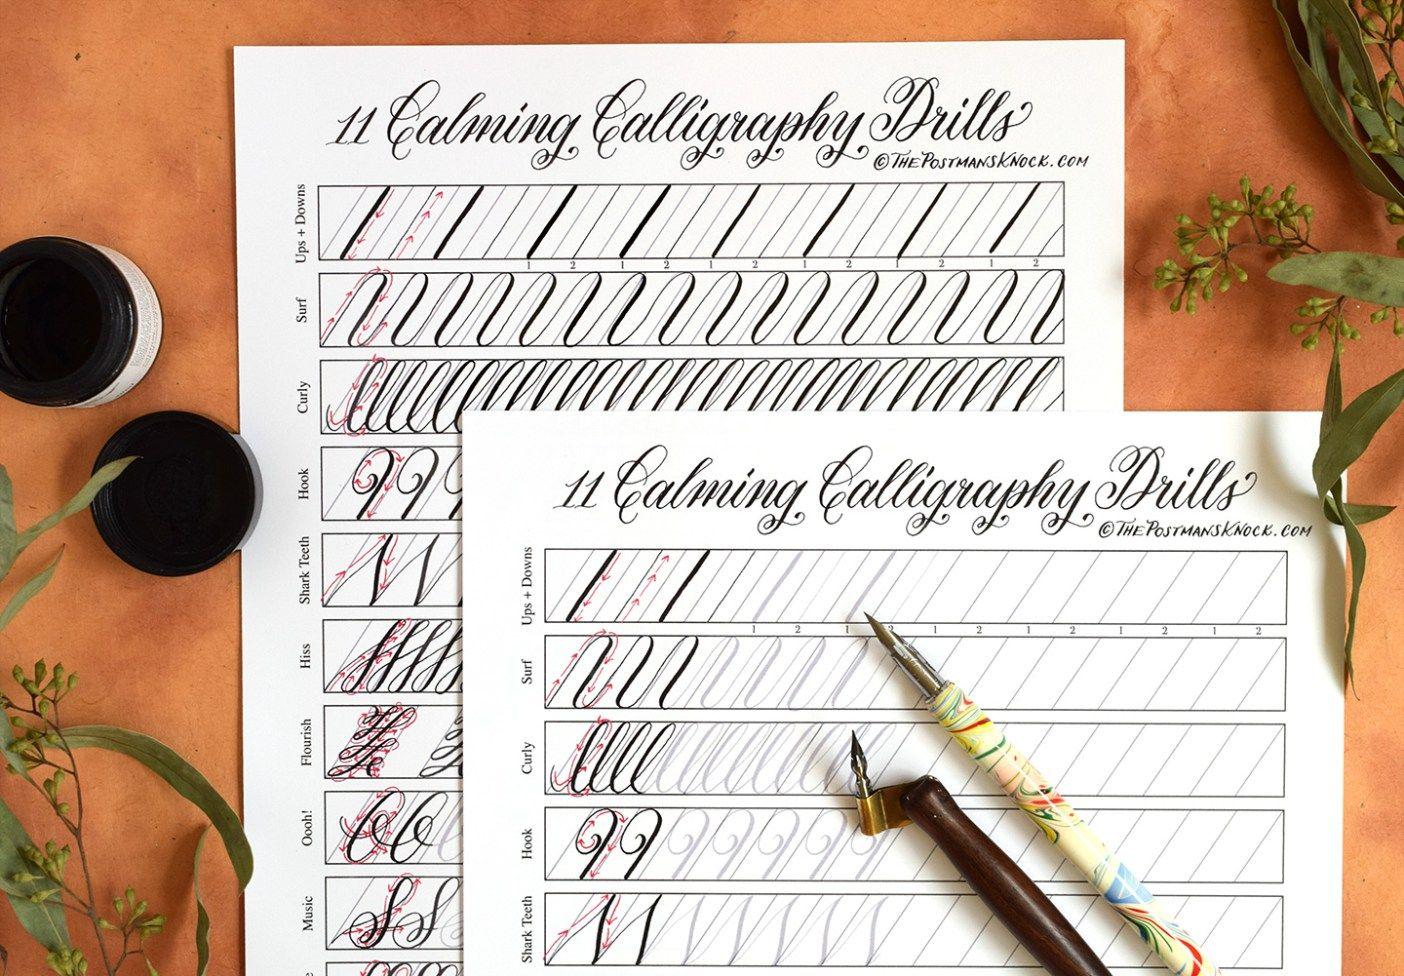 11 Calming Calligraphy Drills Printable Free Download